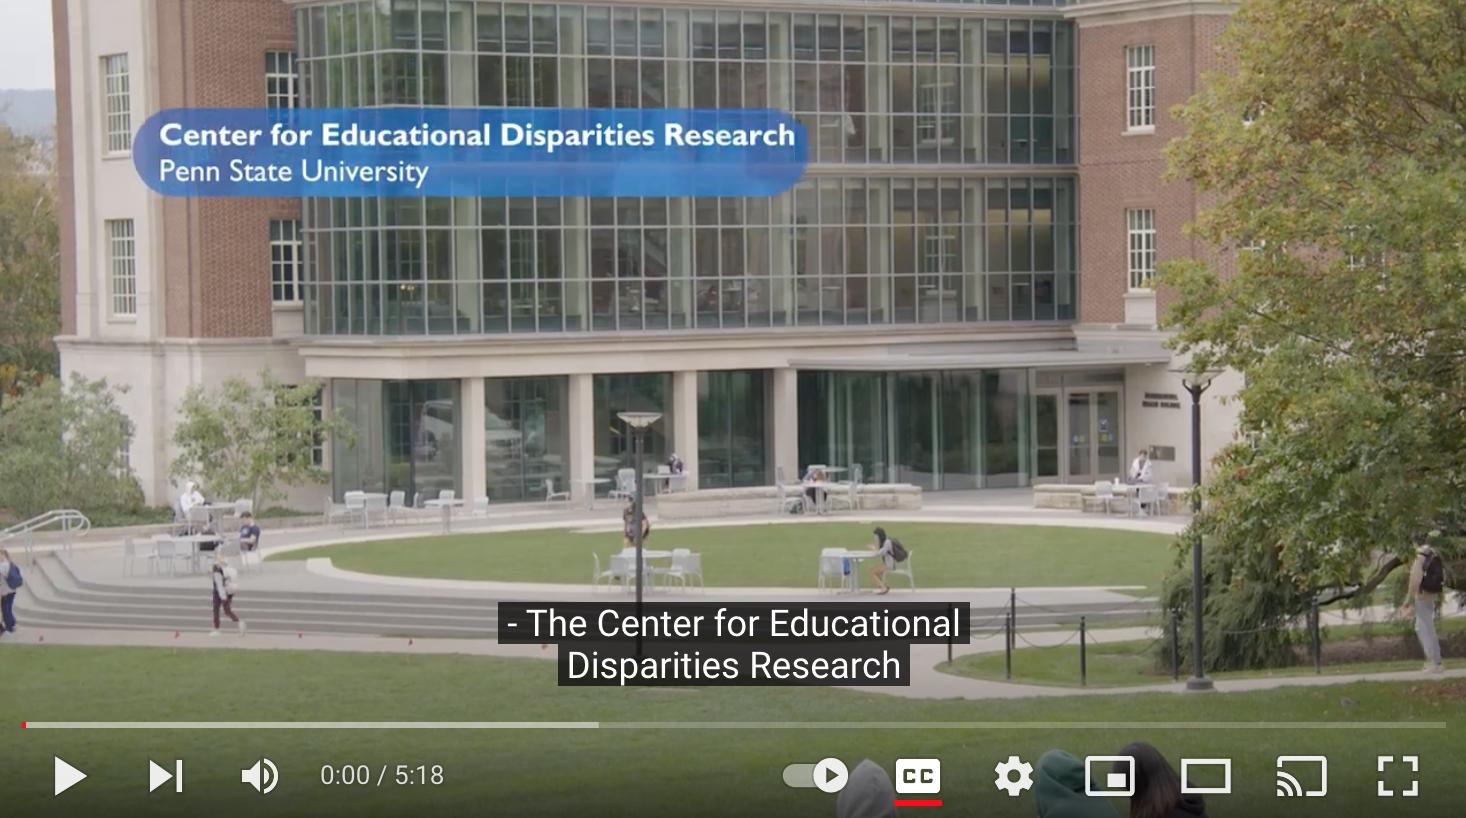 Screen shot of CEDR video showcasing the Biobehavioral Health Building